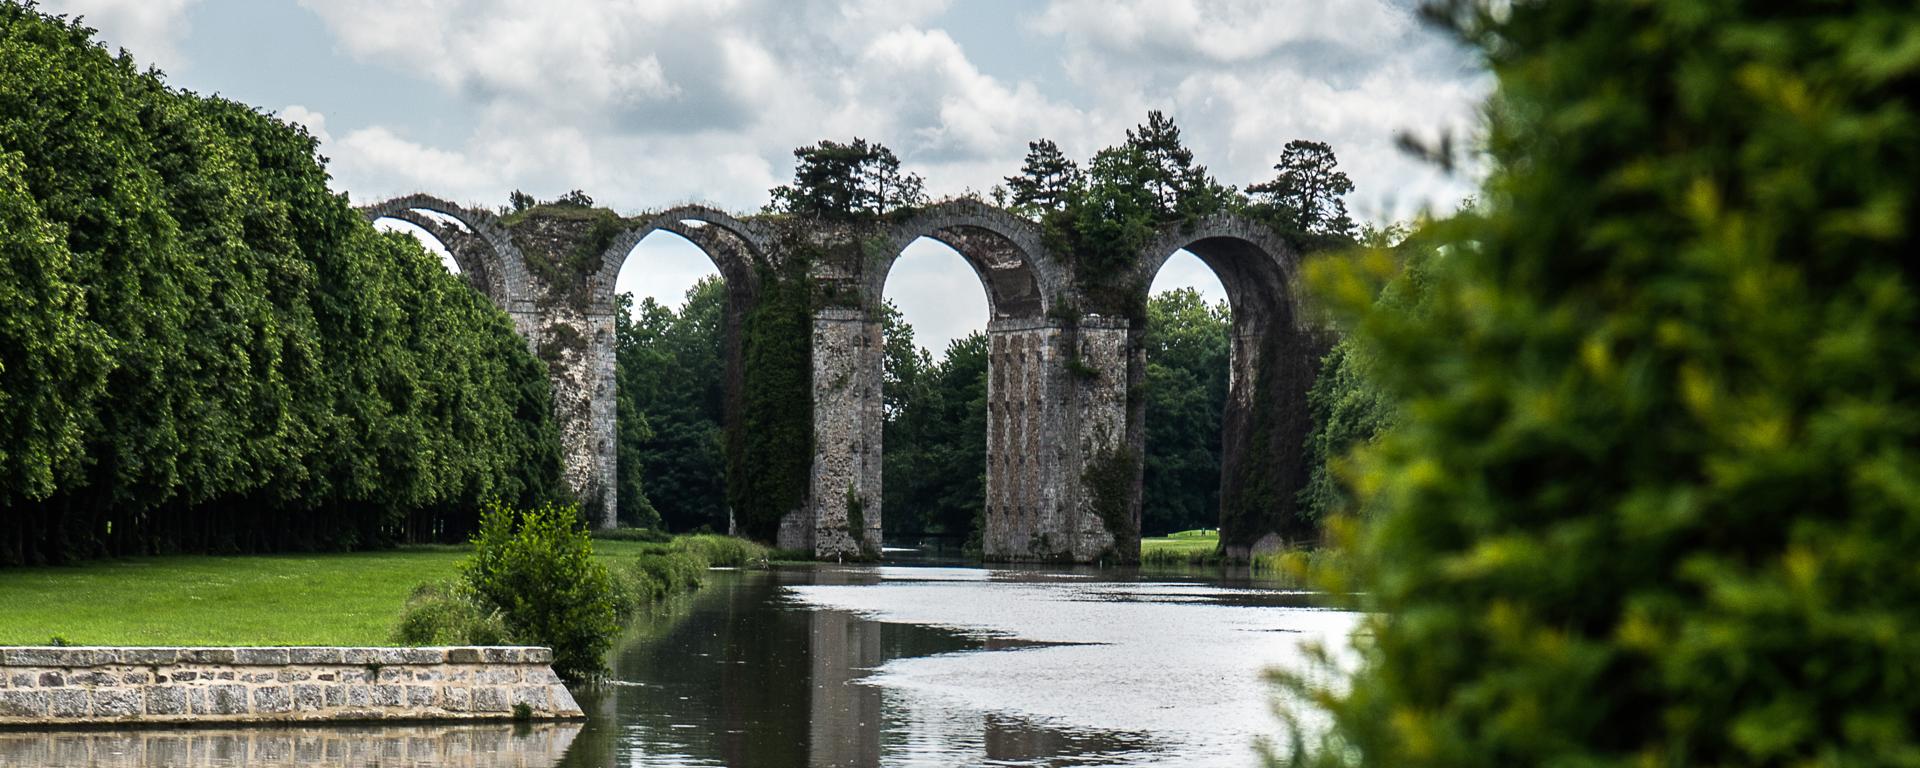 Vue sur l'aqueduc de Maintenon